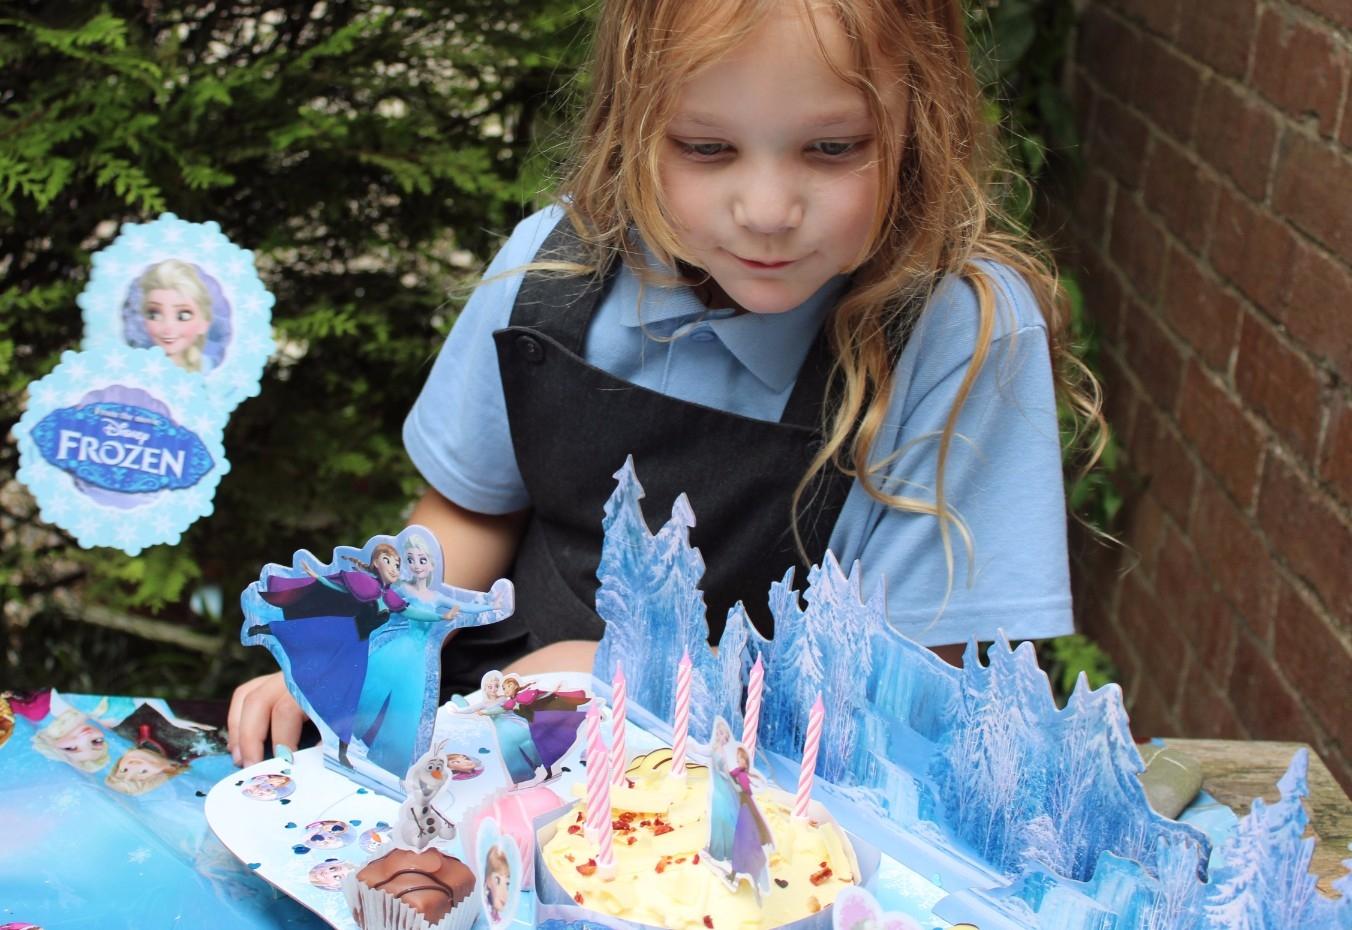 Disney Store Frozen Party Accessories (7)